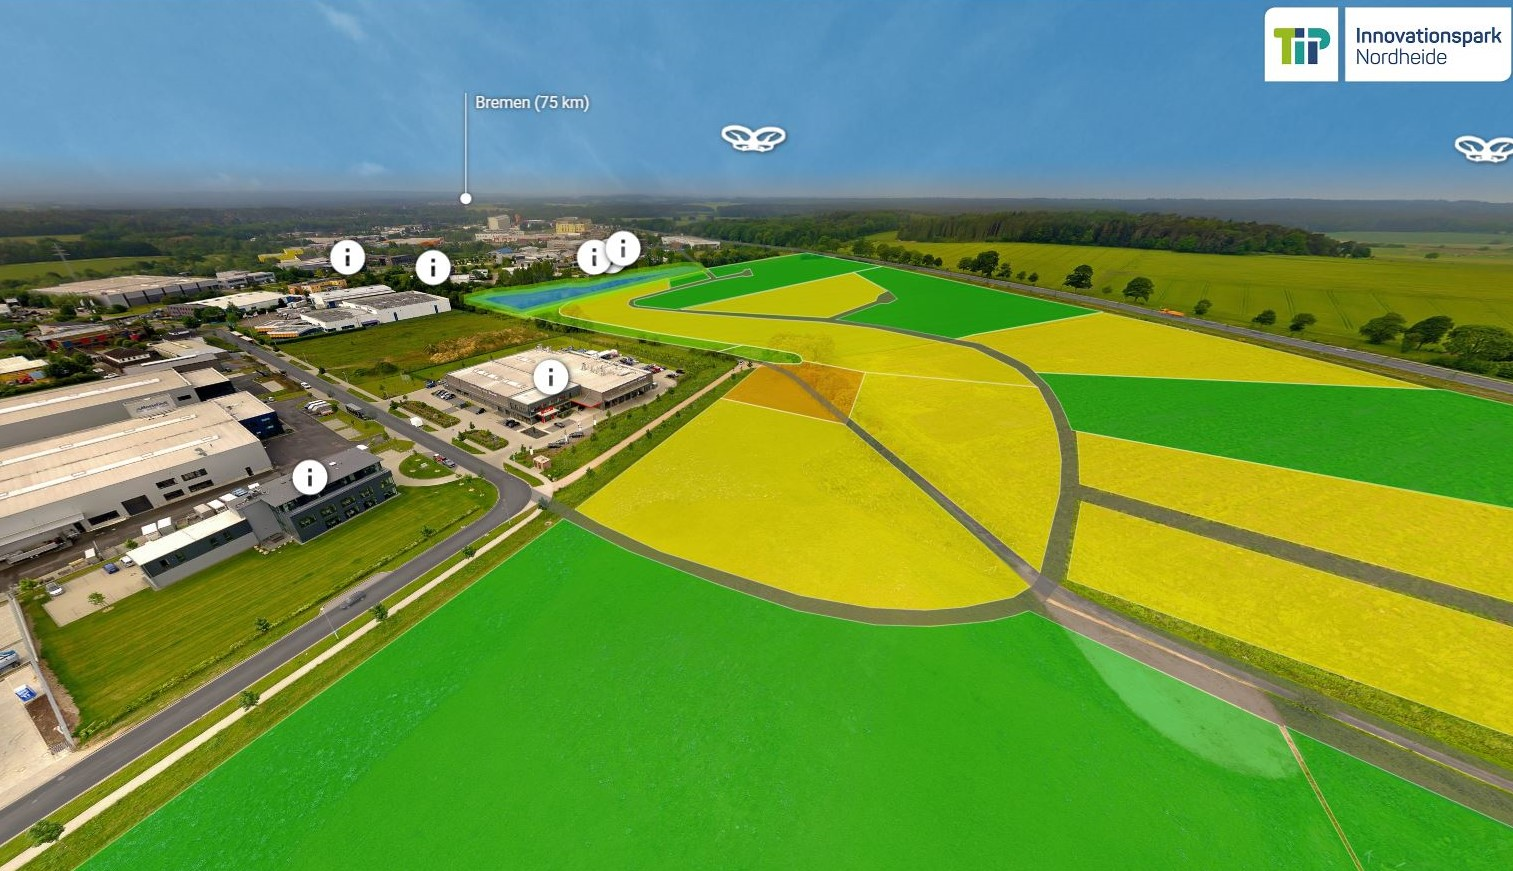 Rundflug über den Tip Innovationspark Nordheide